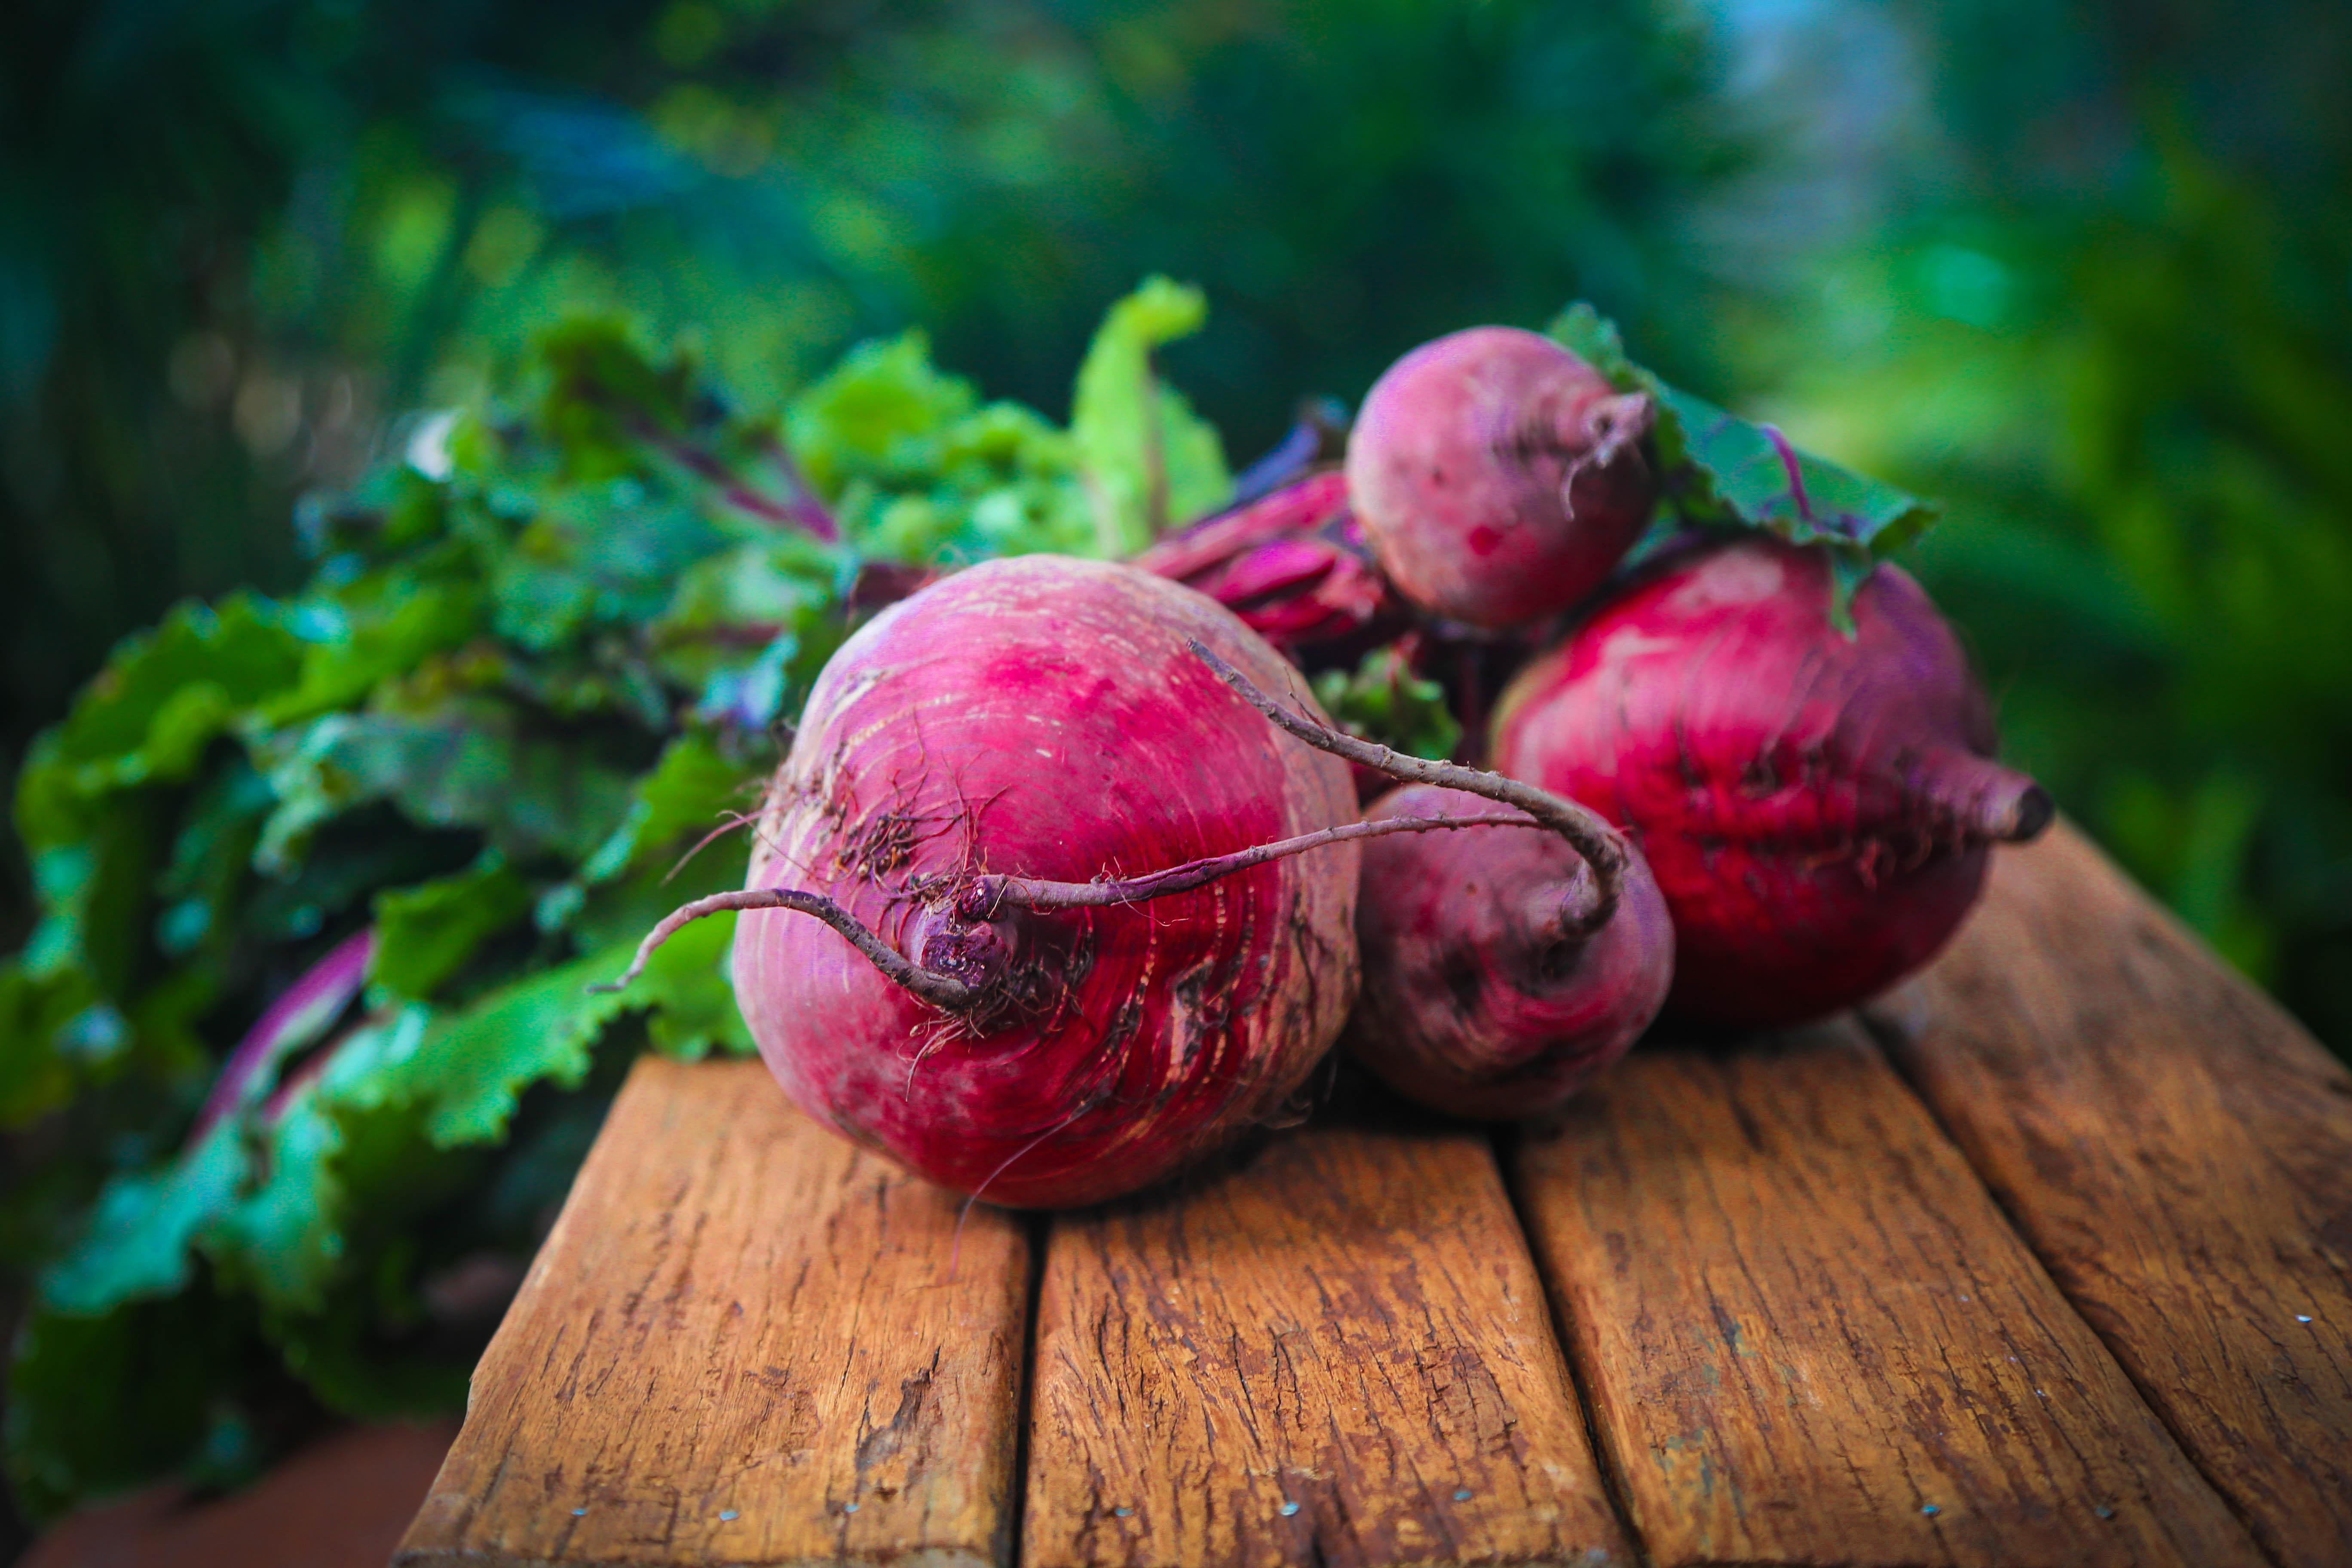 vinpocetin magas vérnyomás ellen magas vérnyomás elleni saláták